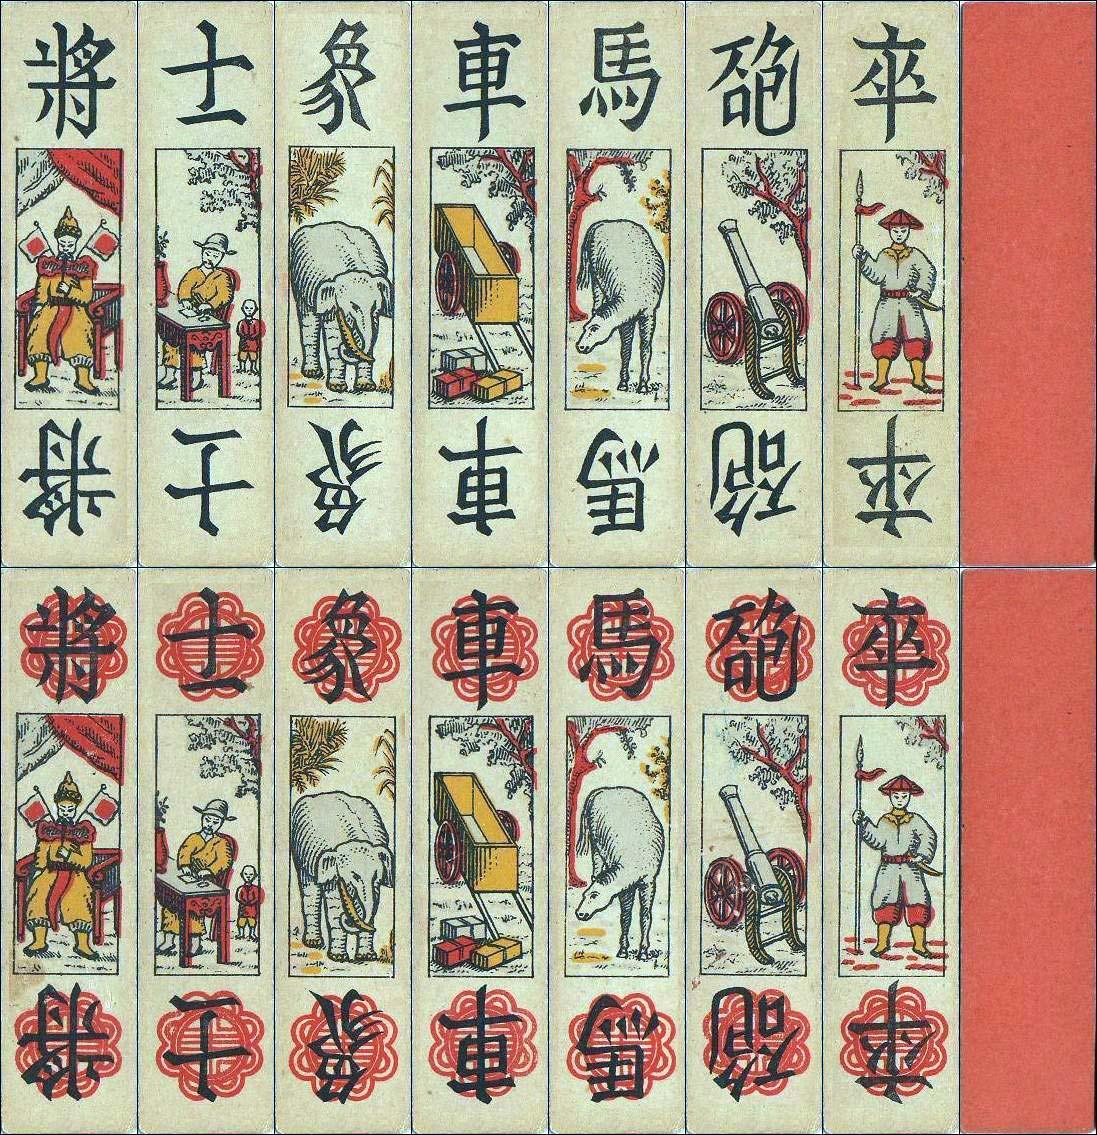 Tam cúc playing cards